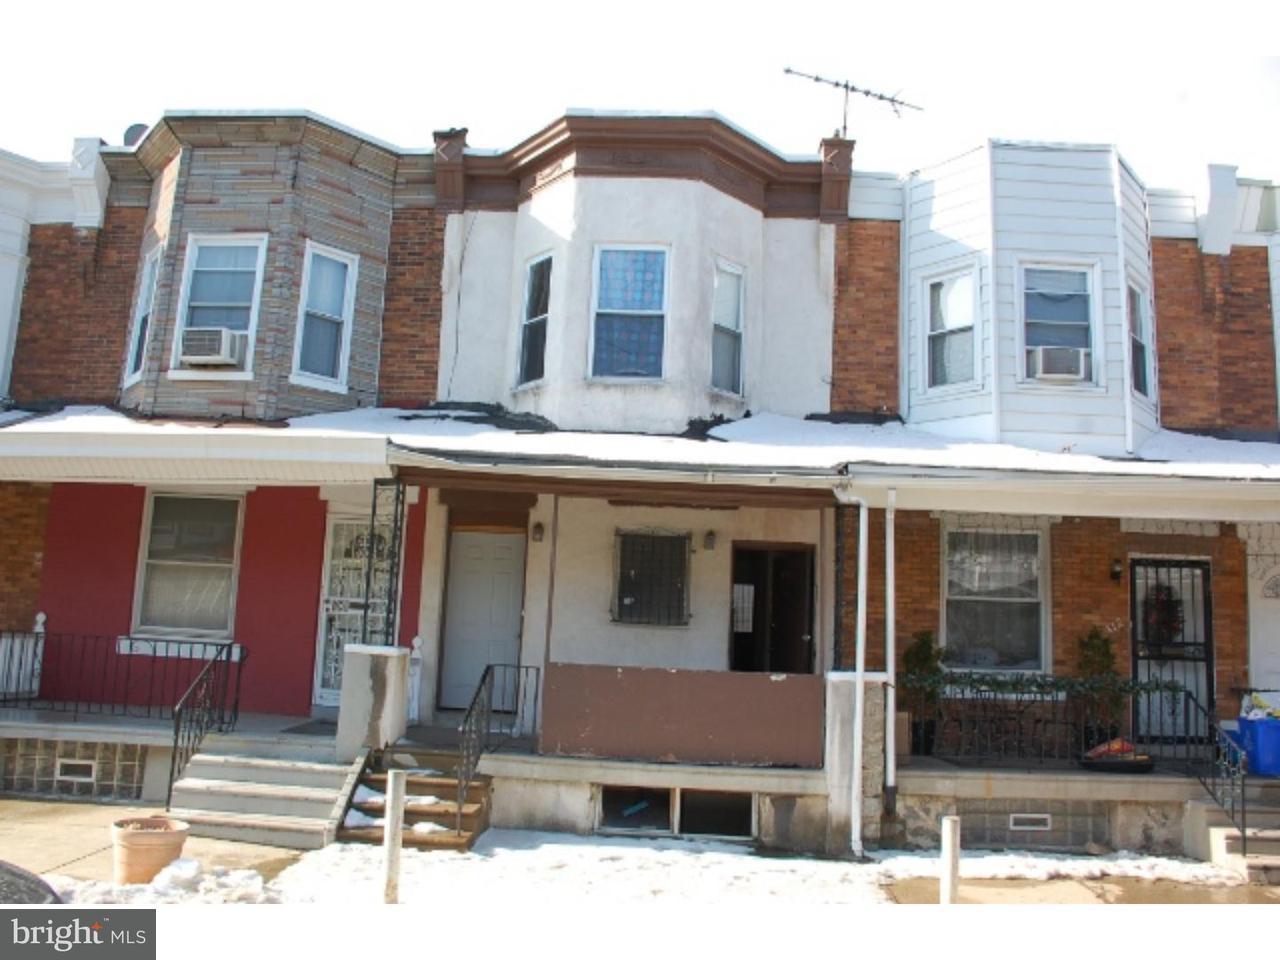 110 N Yewdall Philadelphia , PA 19139